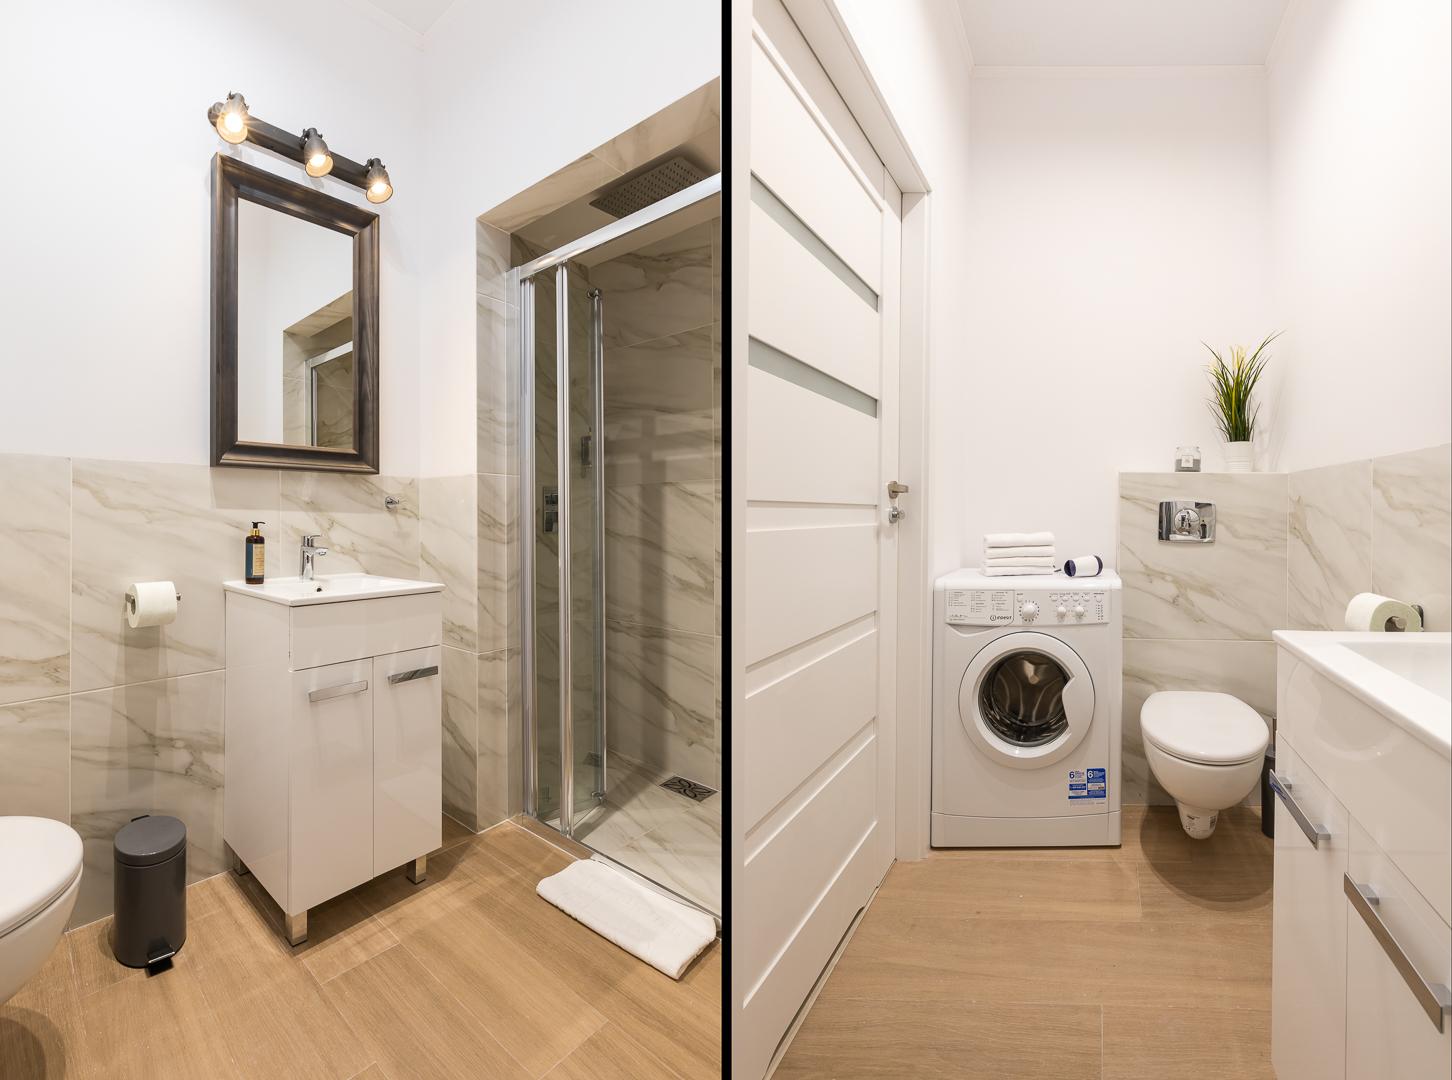 Bathroom at Wspolna Apartments - Citybase Apartments